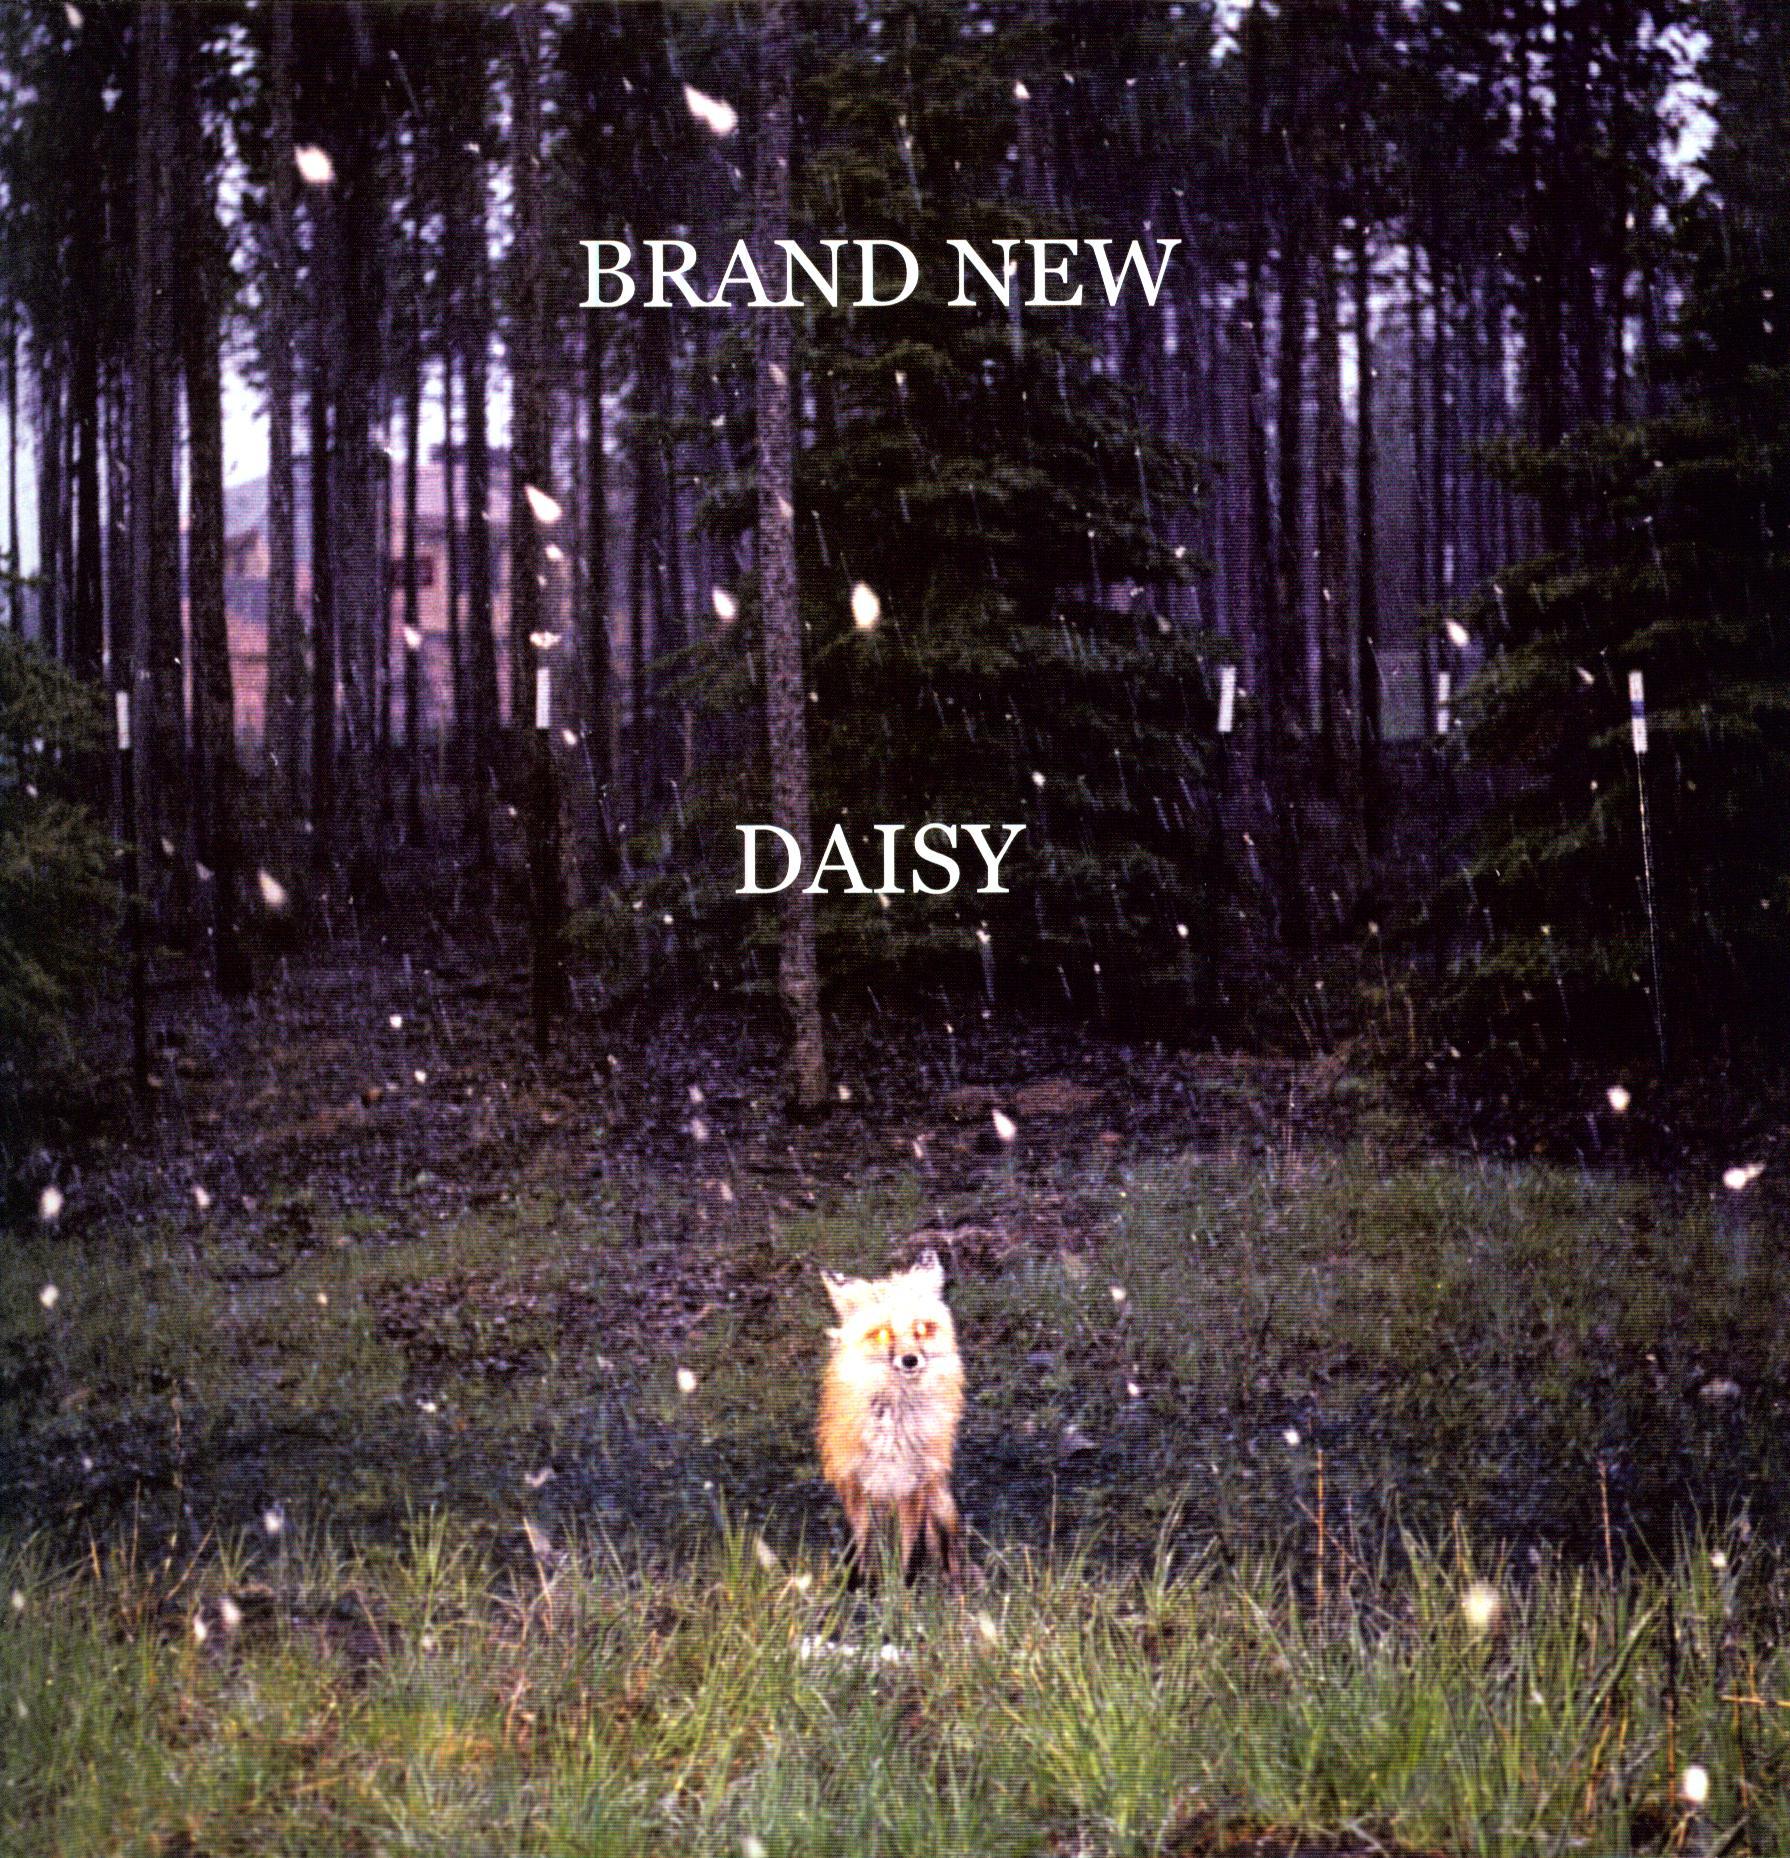 Brand New Daisy Brand new   daisy vinyl 1790x1858